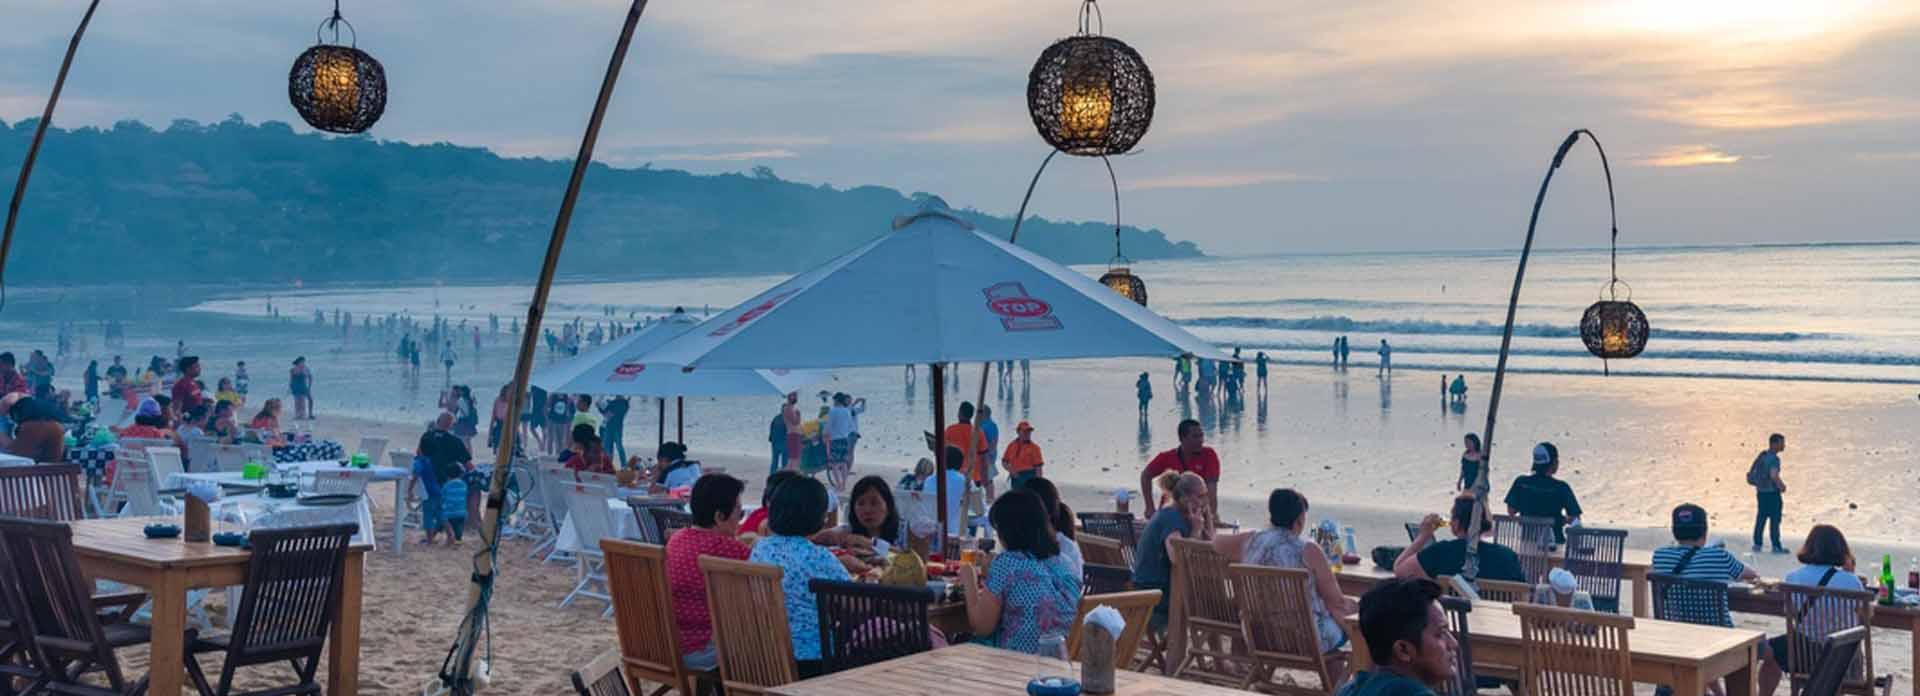 Parikrama Travels Bali Banner 8